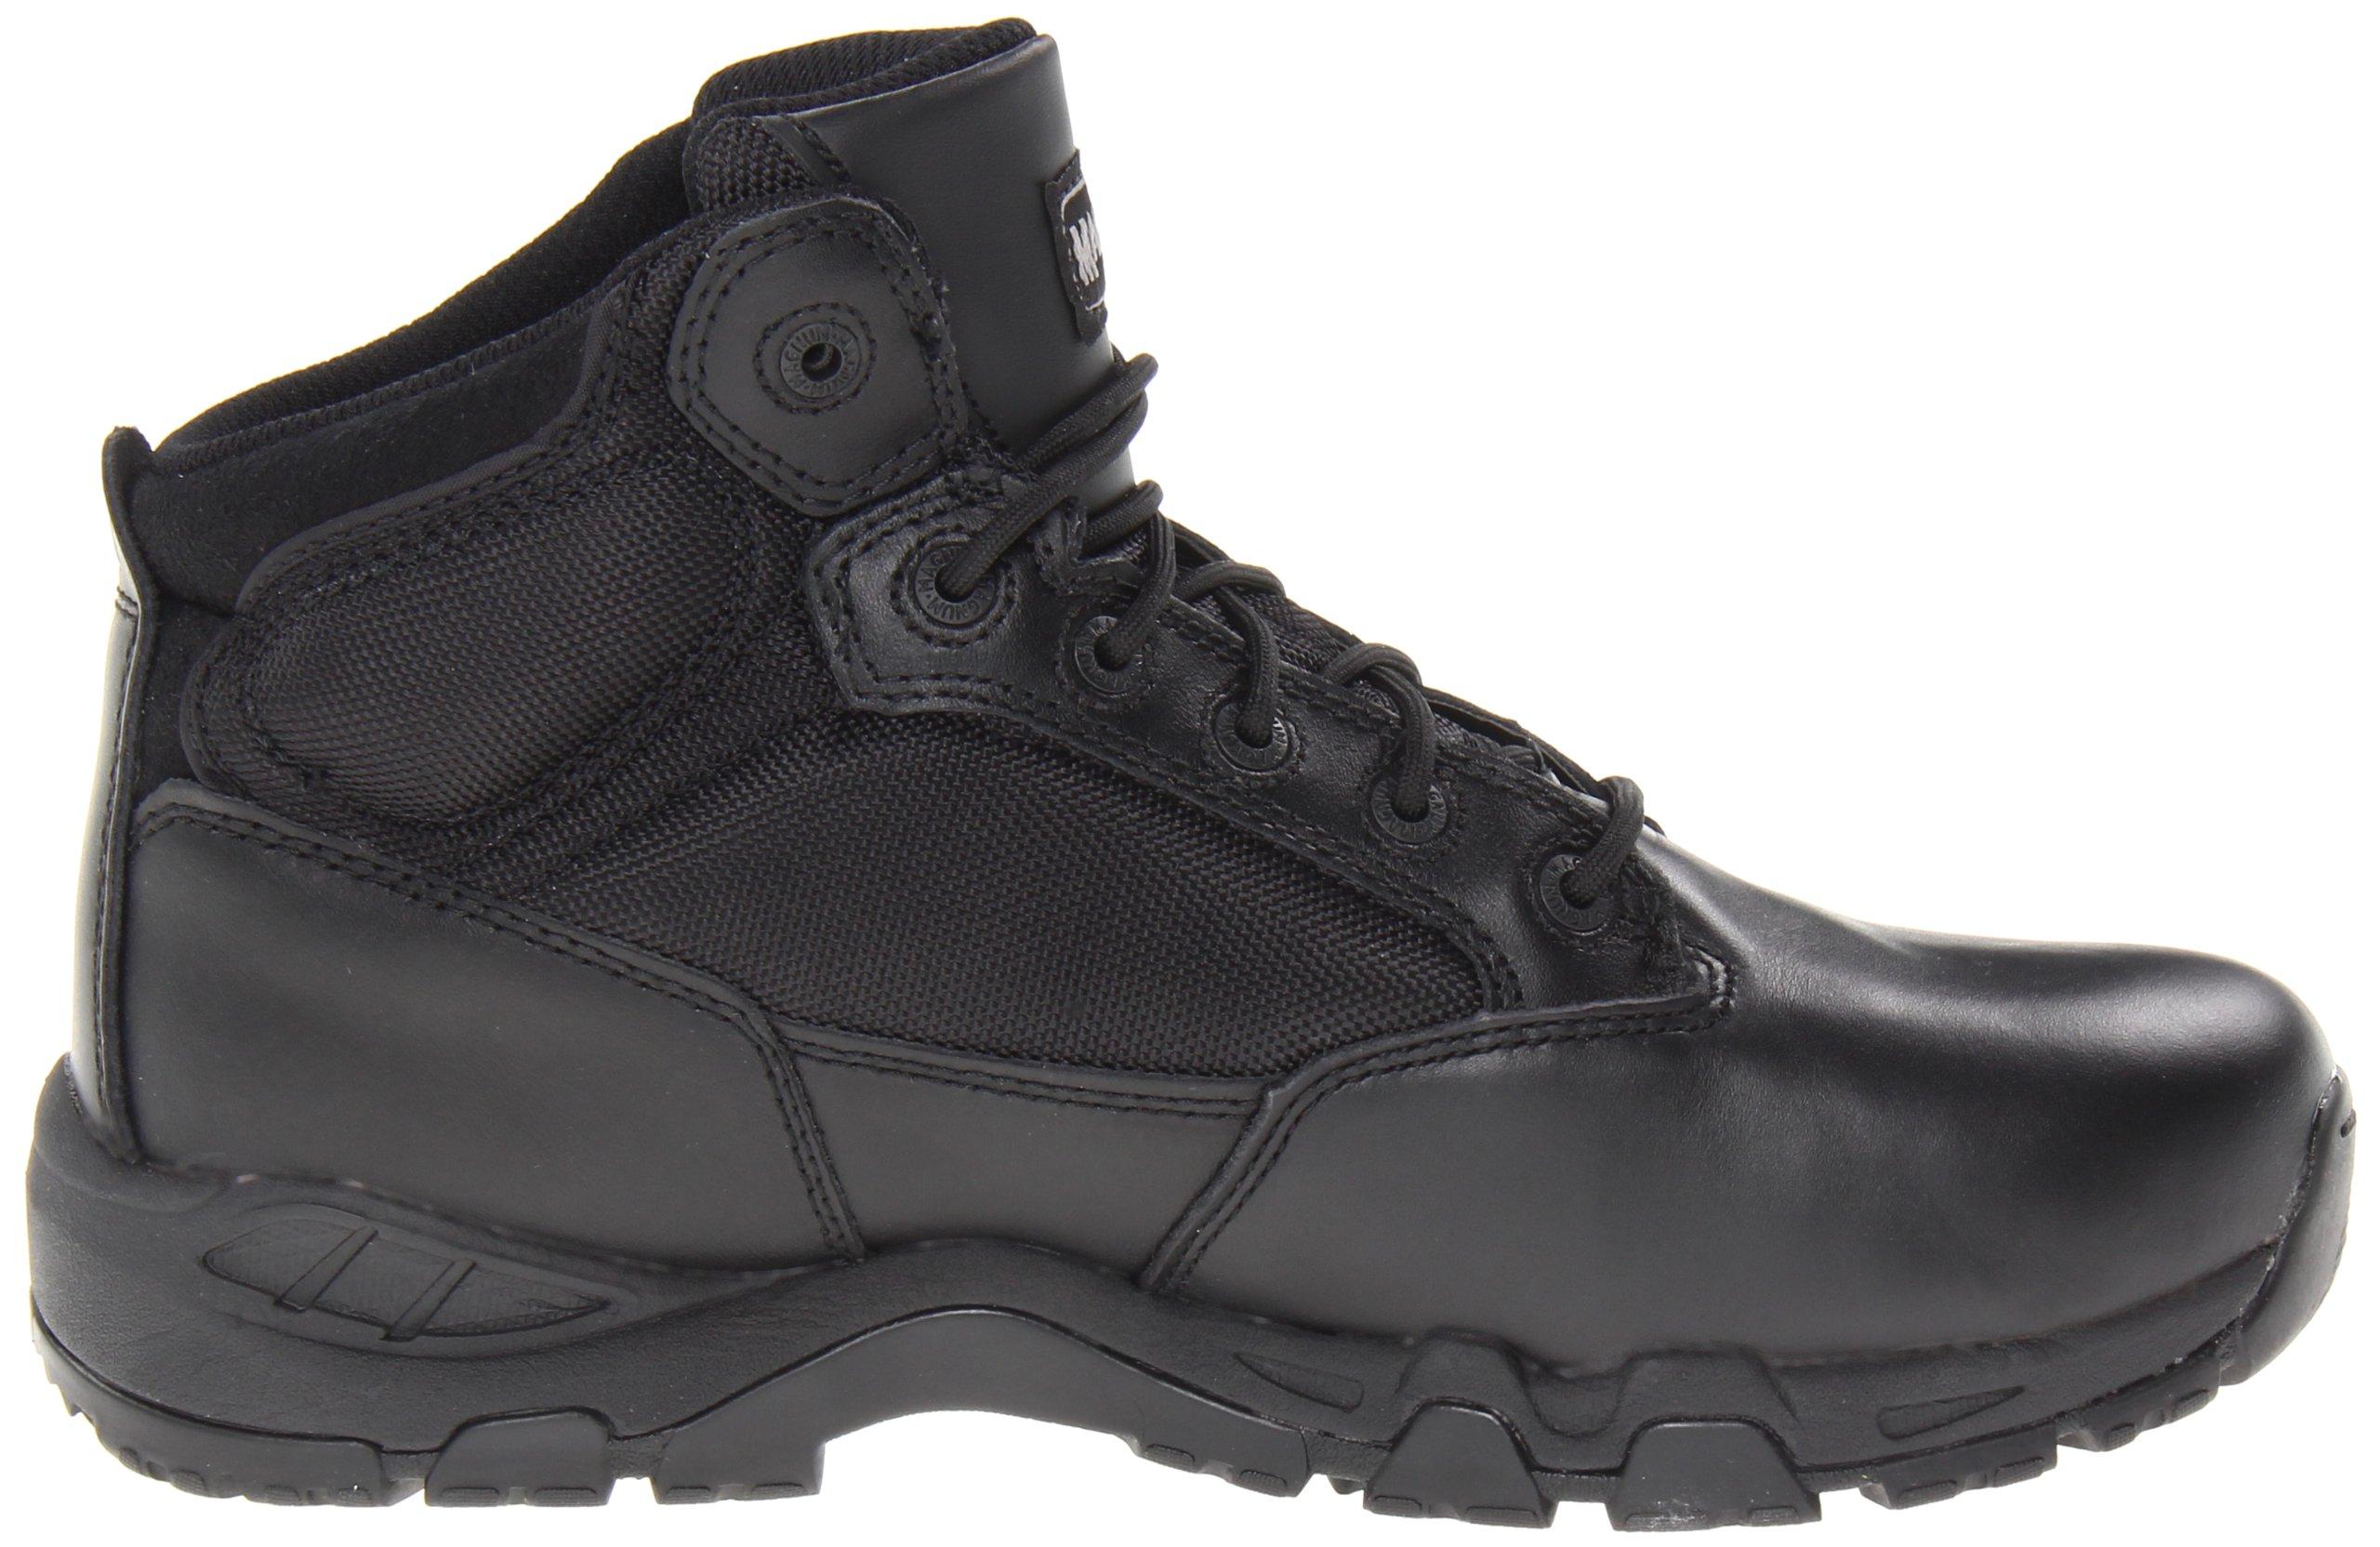 Magnum Men's Viper Pro 5 Waterproof Tactical Boot,Black,13 M US by Magnum (Image #6)